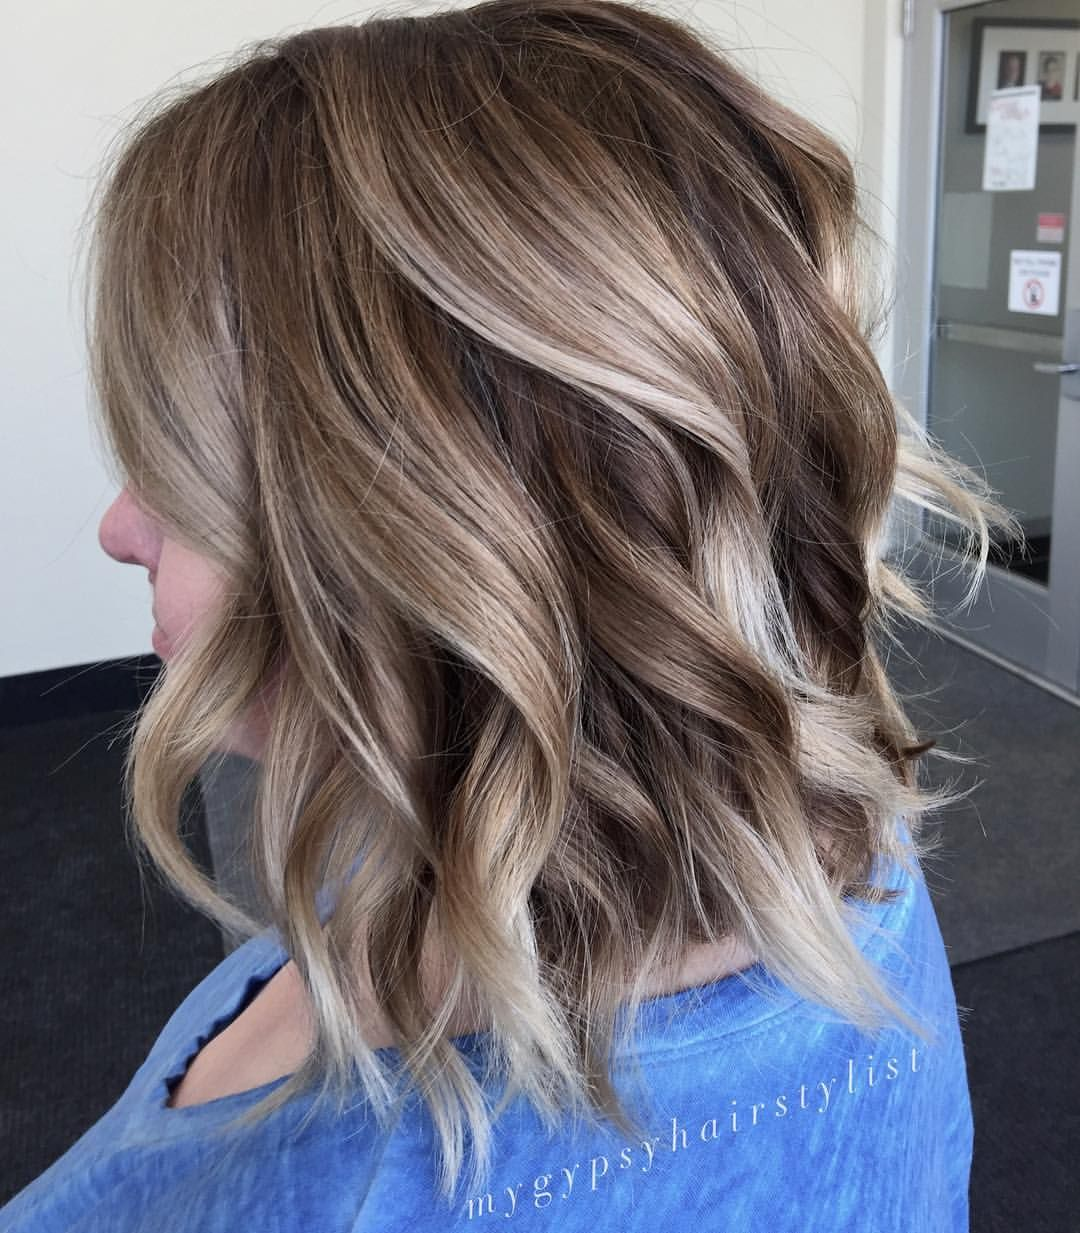 Dimensional Brunette Balayage Textured Lob Medium Length Hair